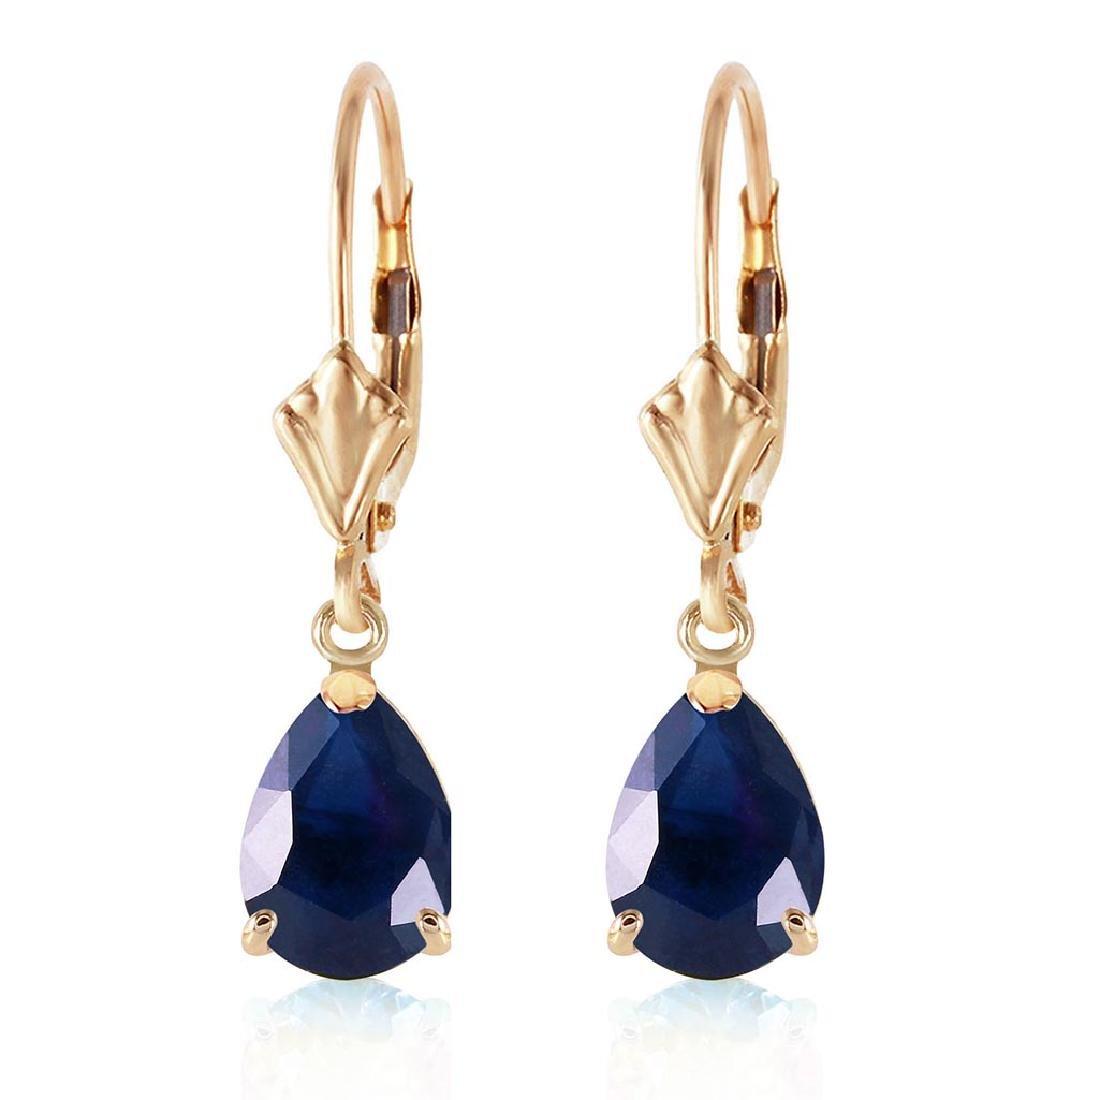 3 Carat 14K Solid Gold Leverback Earrings Sapphire - 2